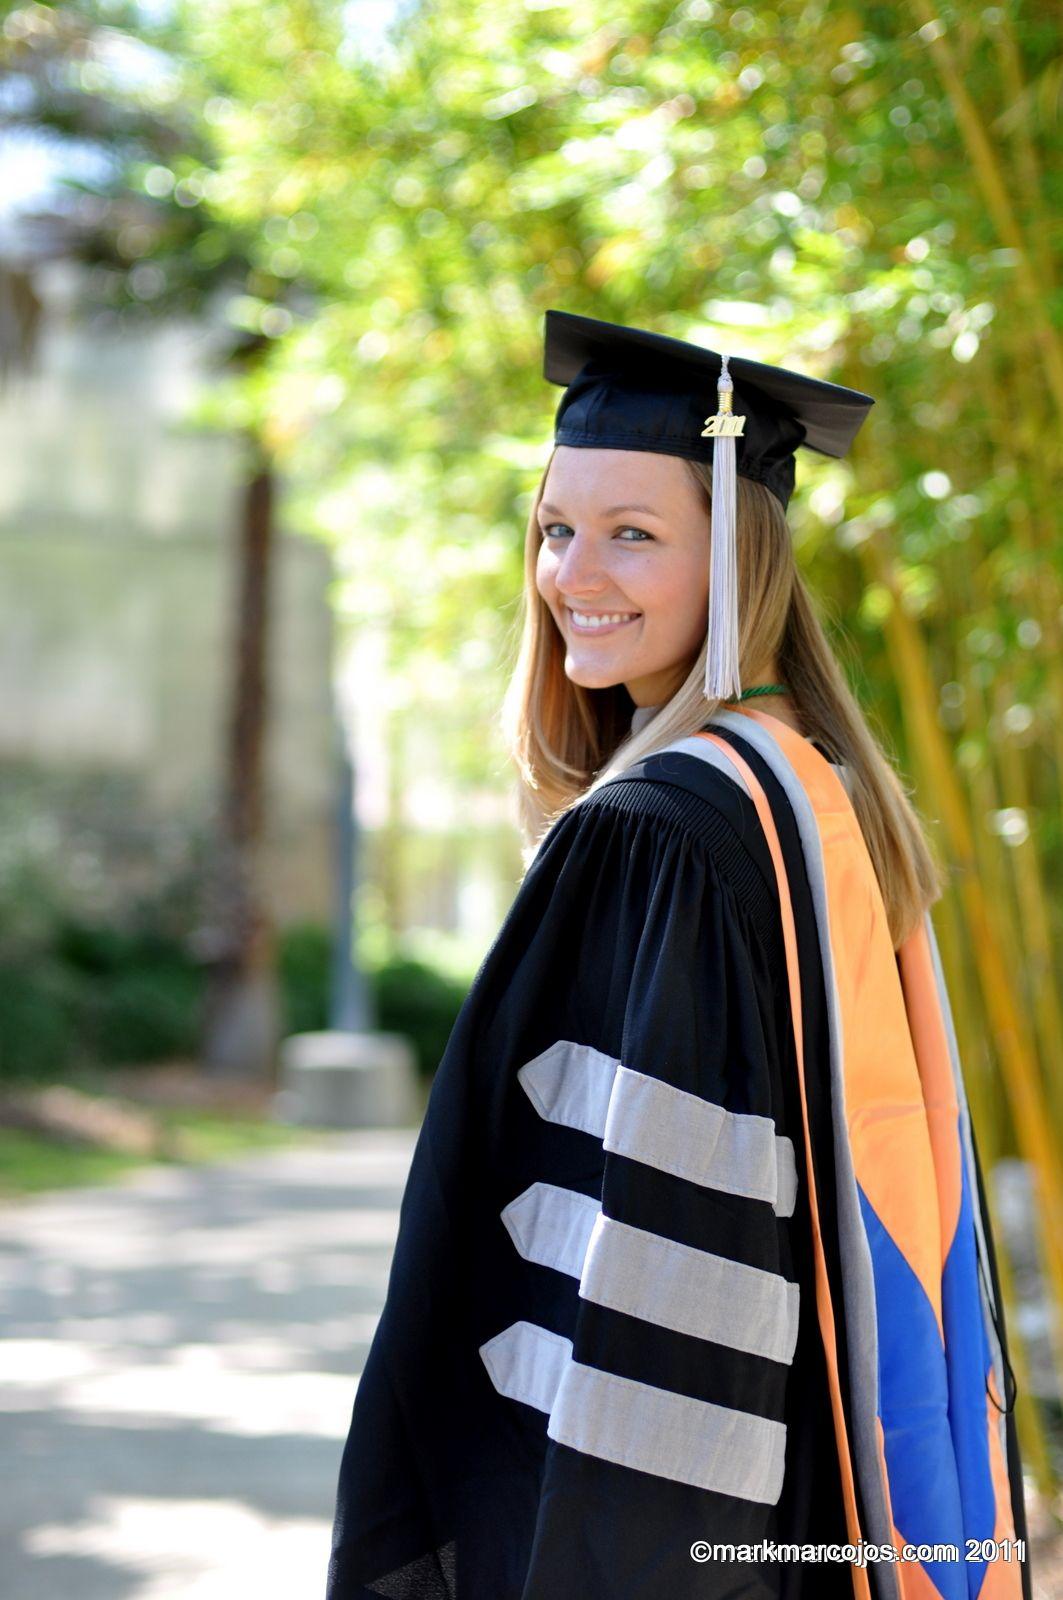 uf graduation poses   College graduation♥ucf/uf/unf   Pinterest ...